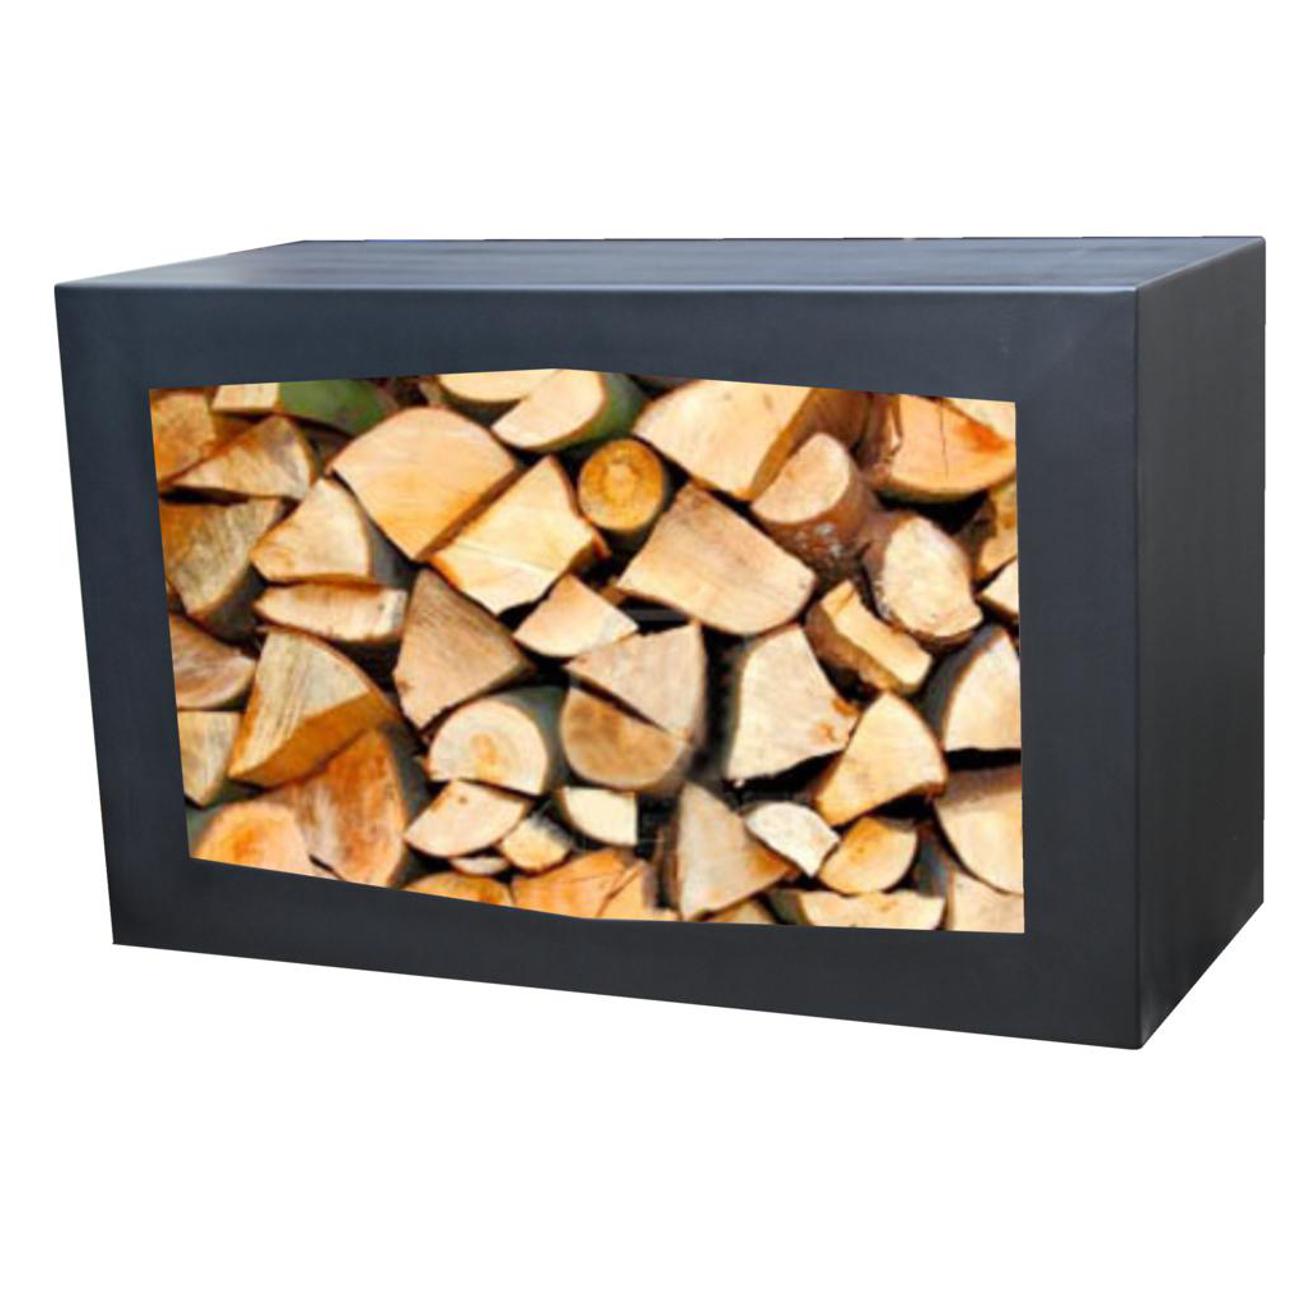 woodbox-schwarz-webAXjm5Hmms8RbQ